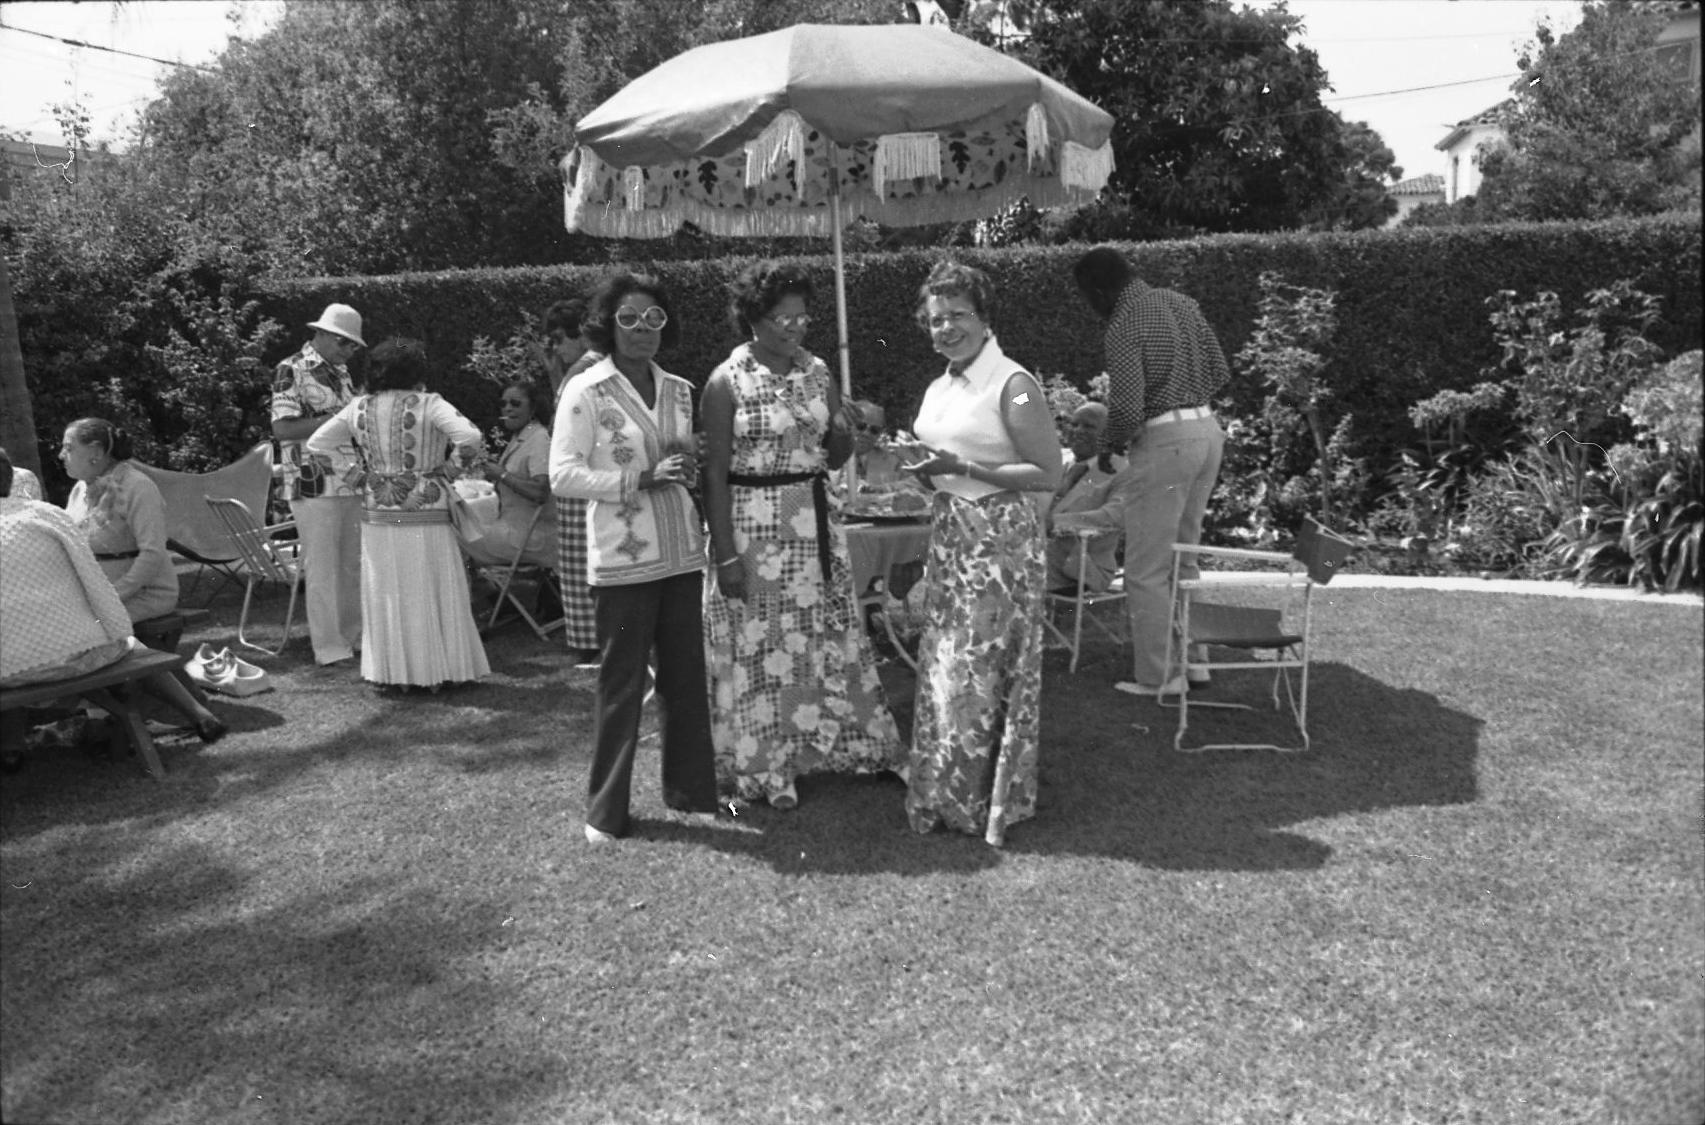 Men and women talking at a backyard garden party in Oakland, circa 1970s. | Oakland Public Library Digital Collections